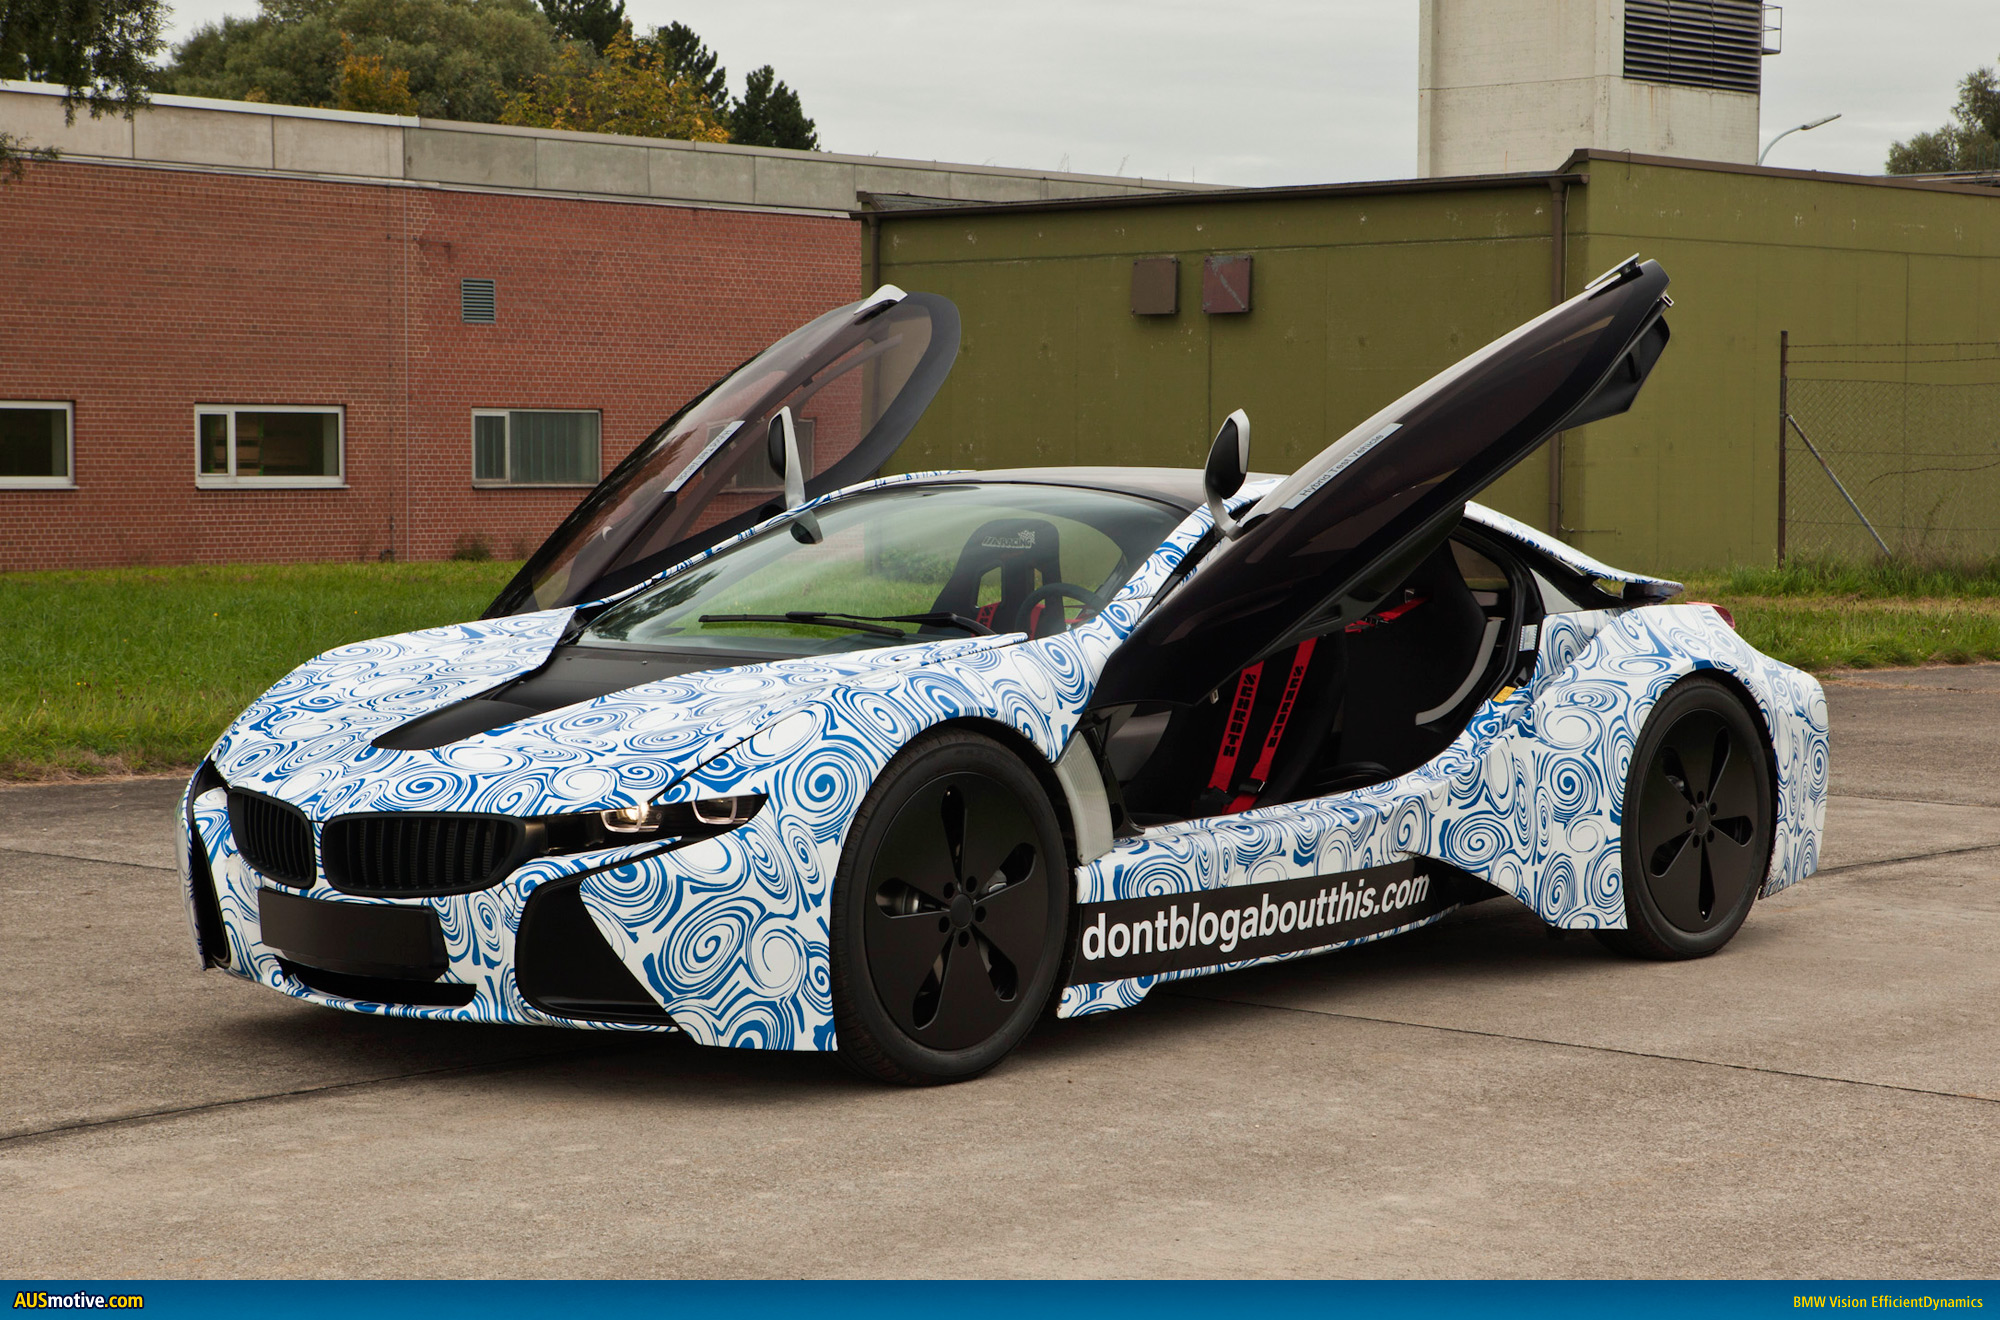 AUSmotive.com » BMW turns vision into reality